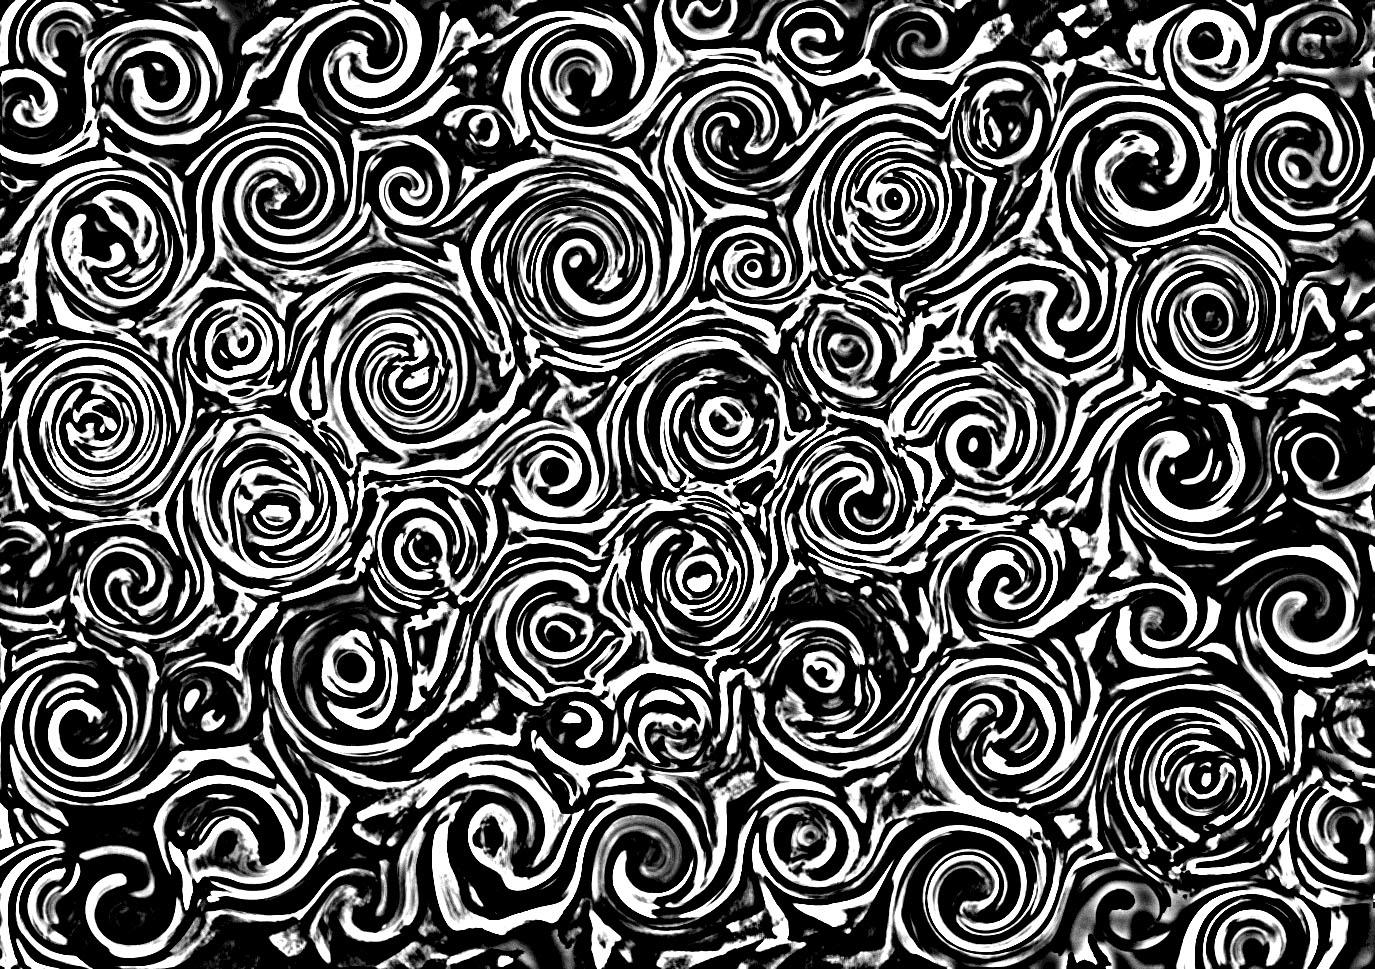 manga swirl pattern shock1 by ryunoohi on deviantart. Black Bedroom Furniture Sets. Home Design Ideas